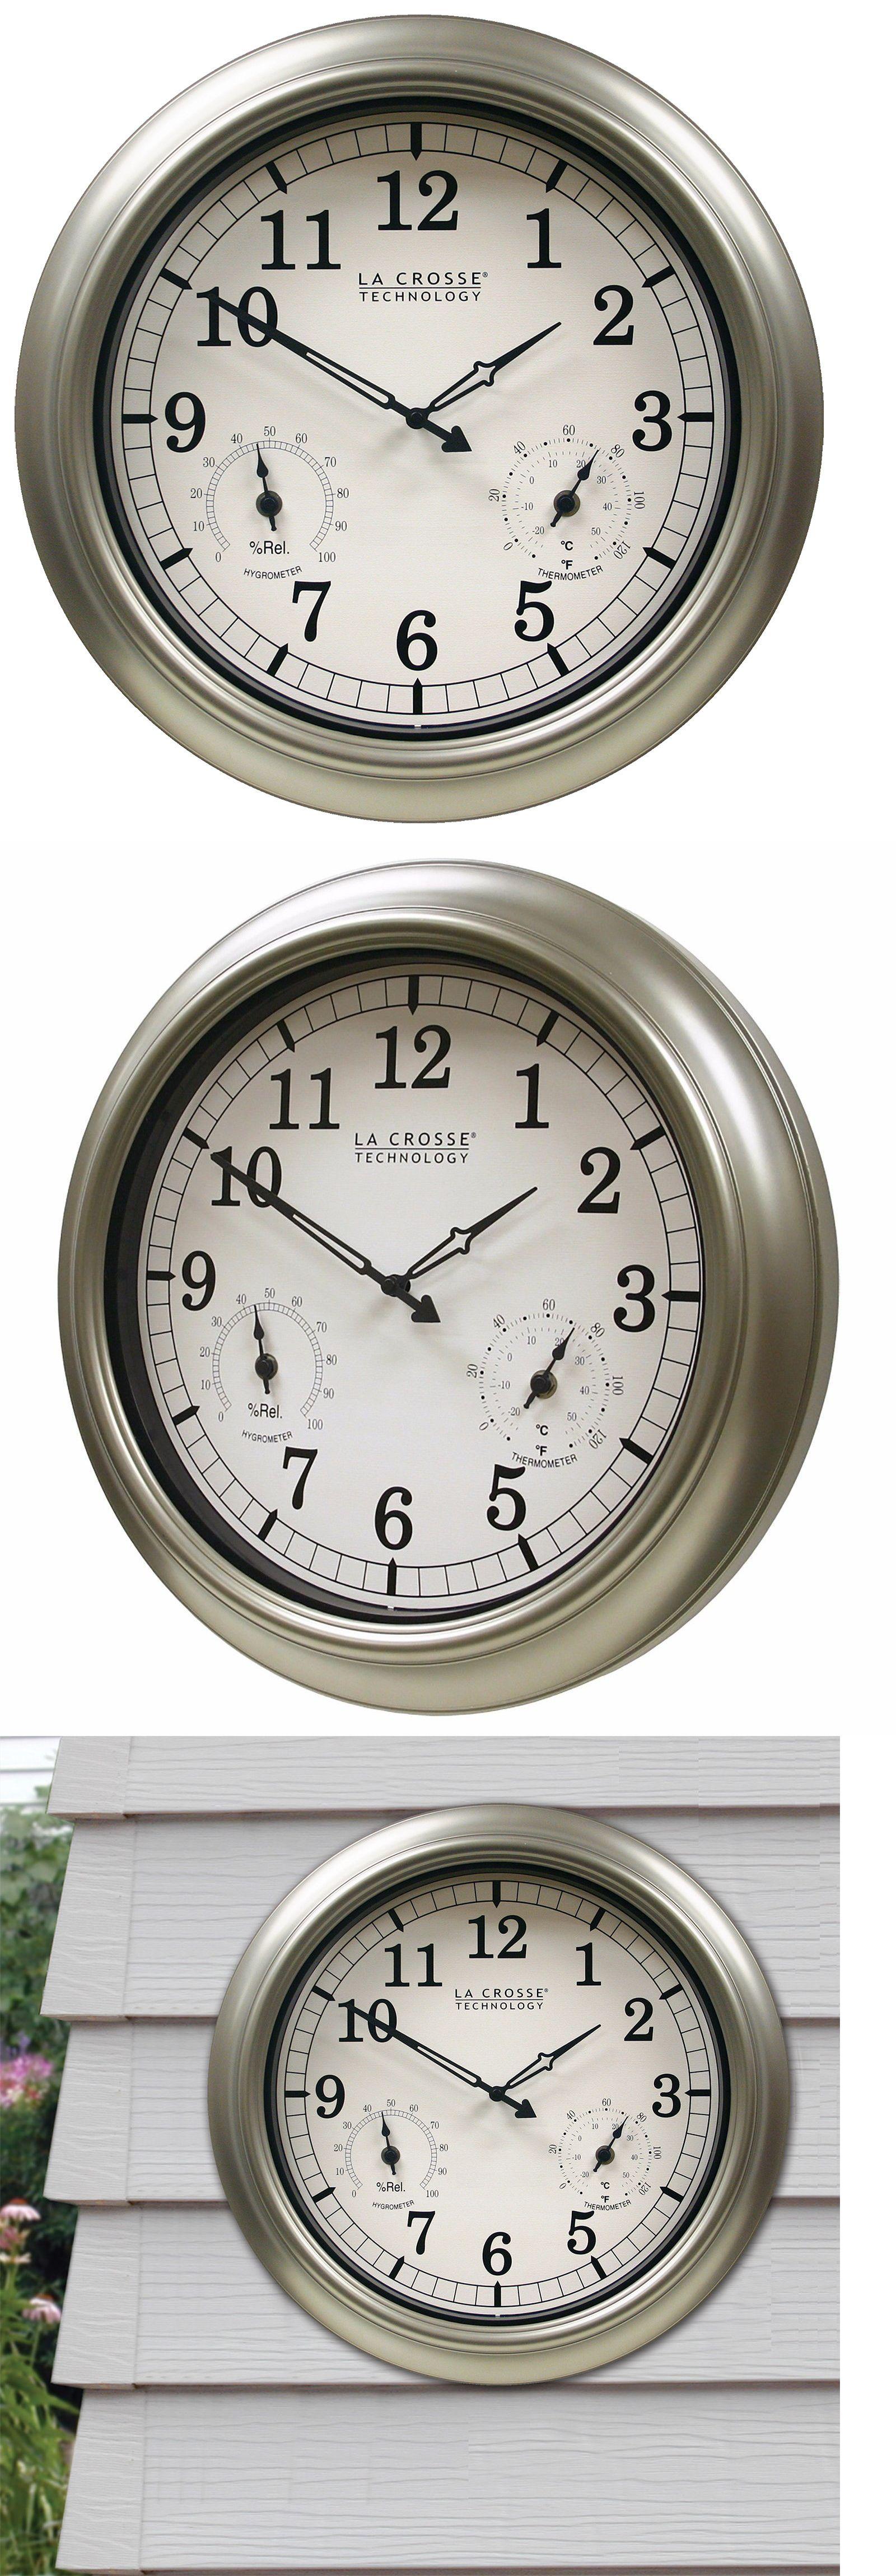 Wall Clocks 20561: Wt-3181Pl-Q La Crosse Technology 18 Indoor Outdoor Wall